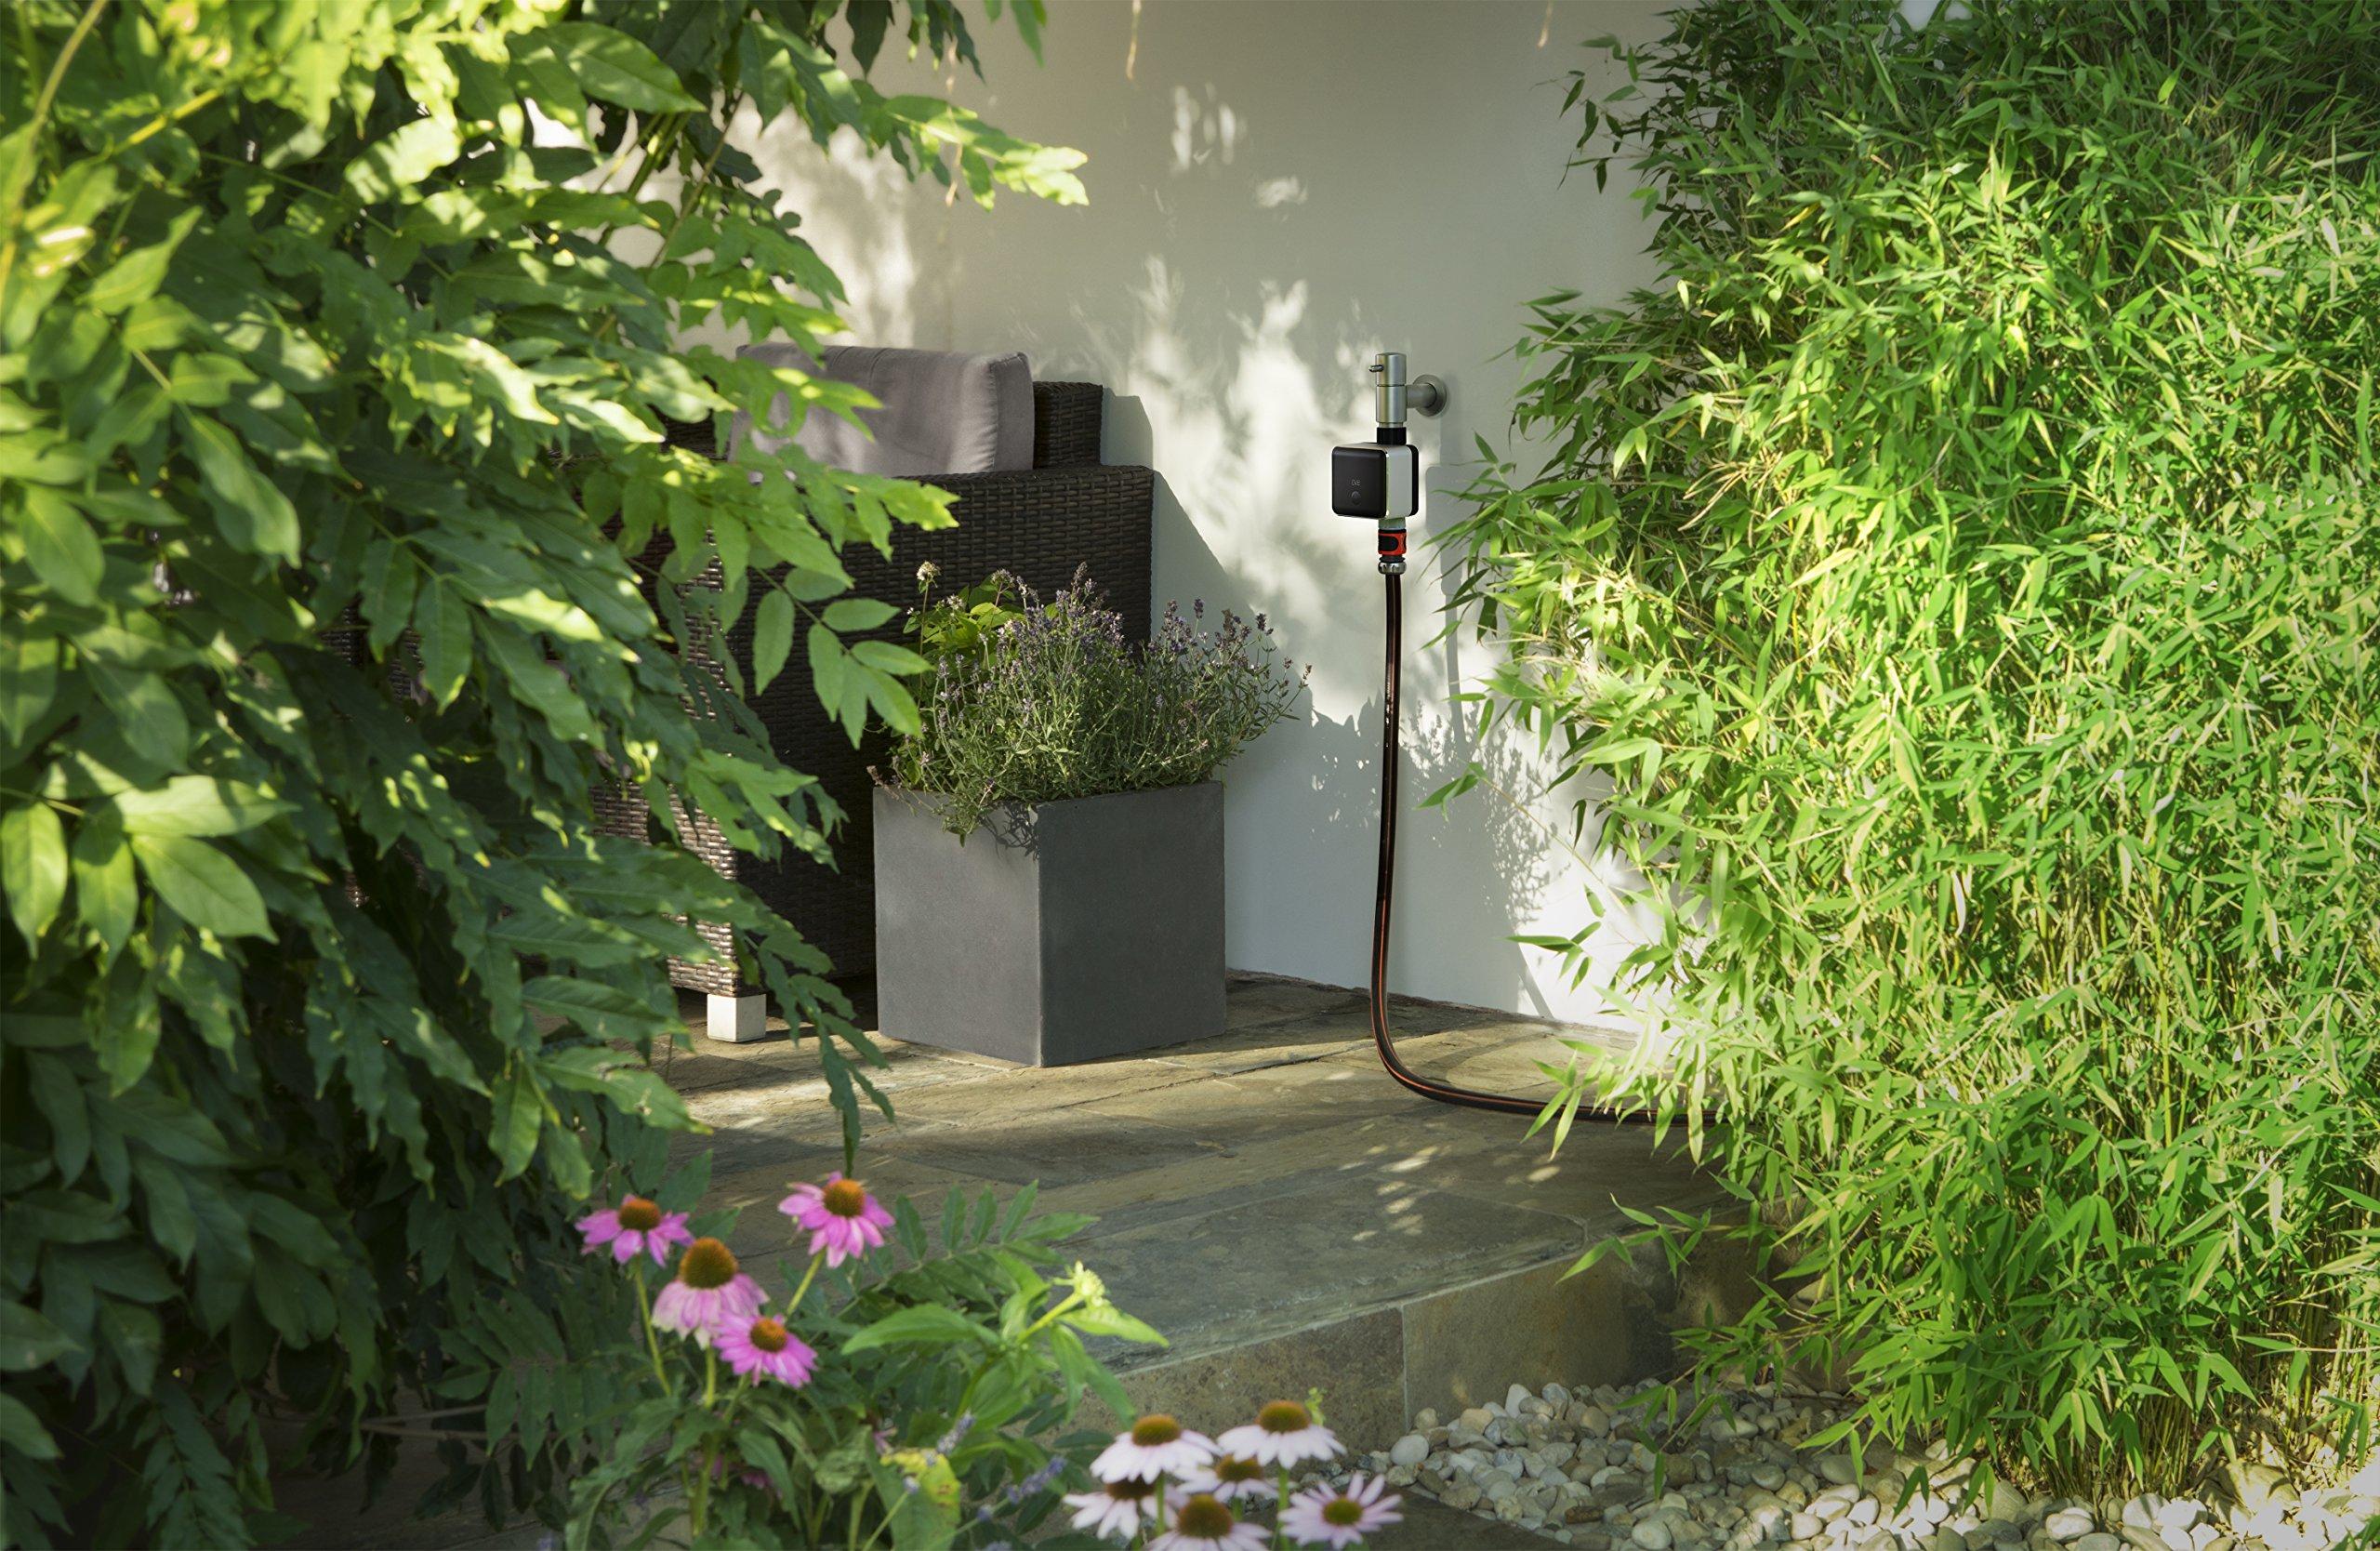 Eve Aqua (Vorgängermodell) - Smarte Bewässerungssteuerung per Home App, mit Zeitplänen automatisch bewässern, Siri…